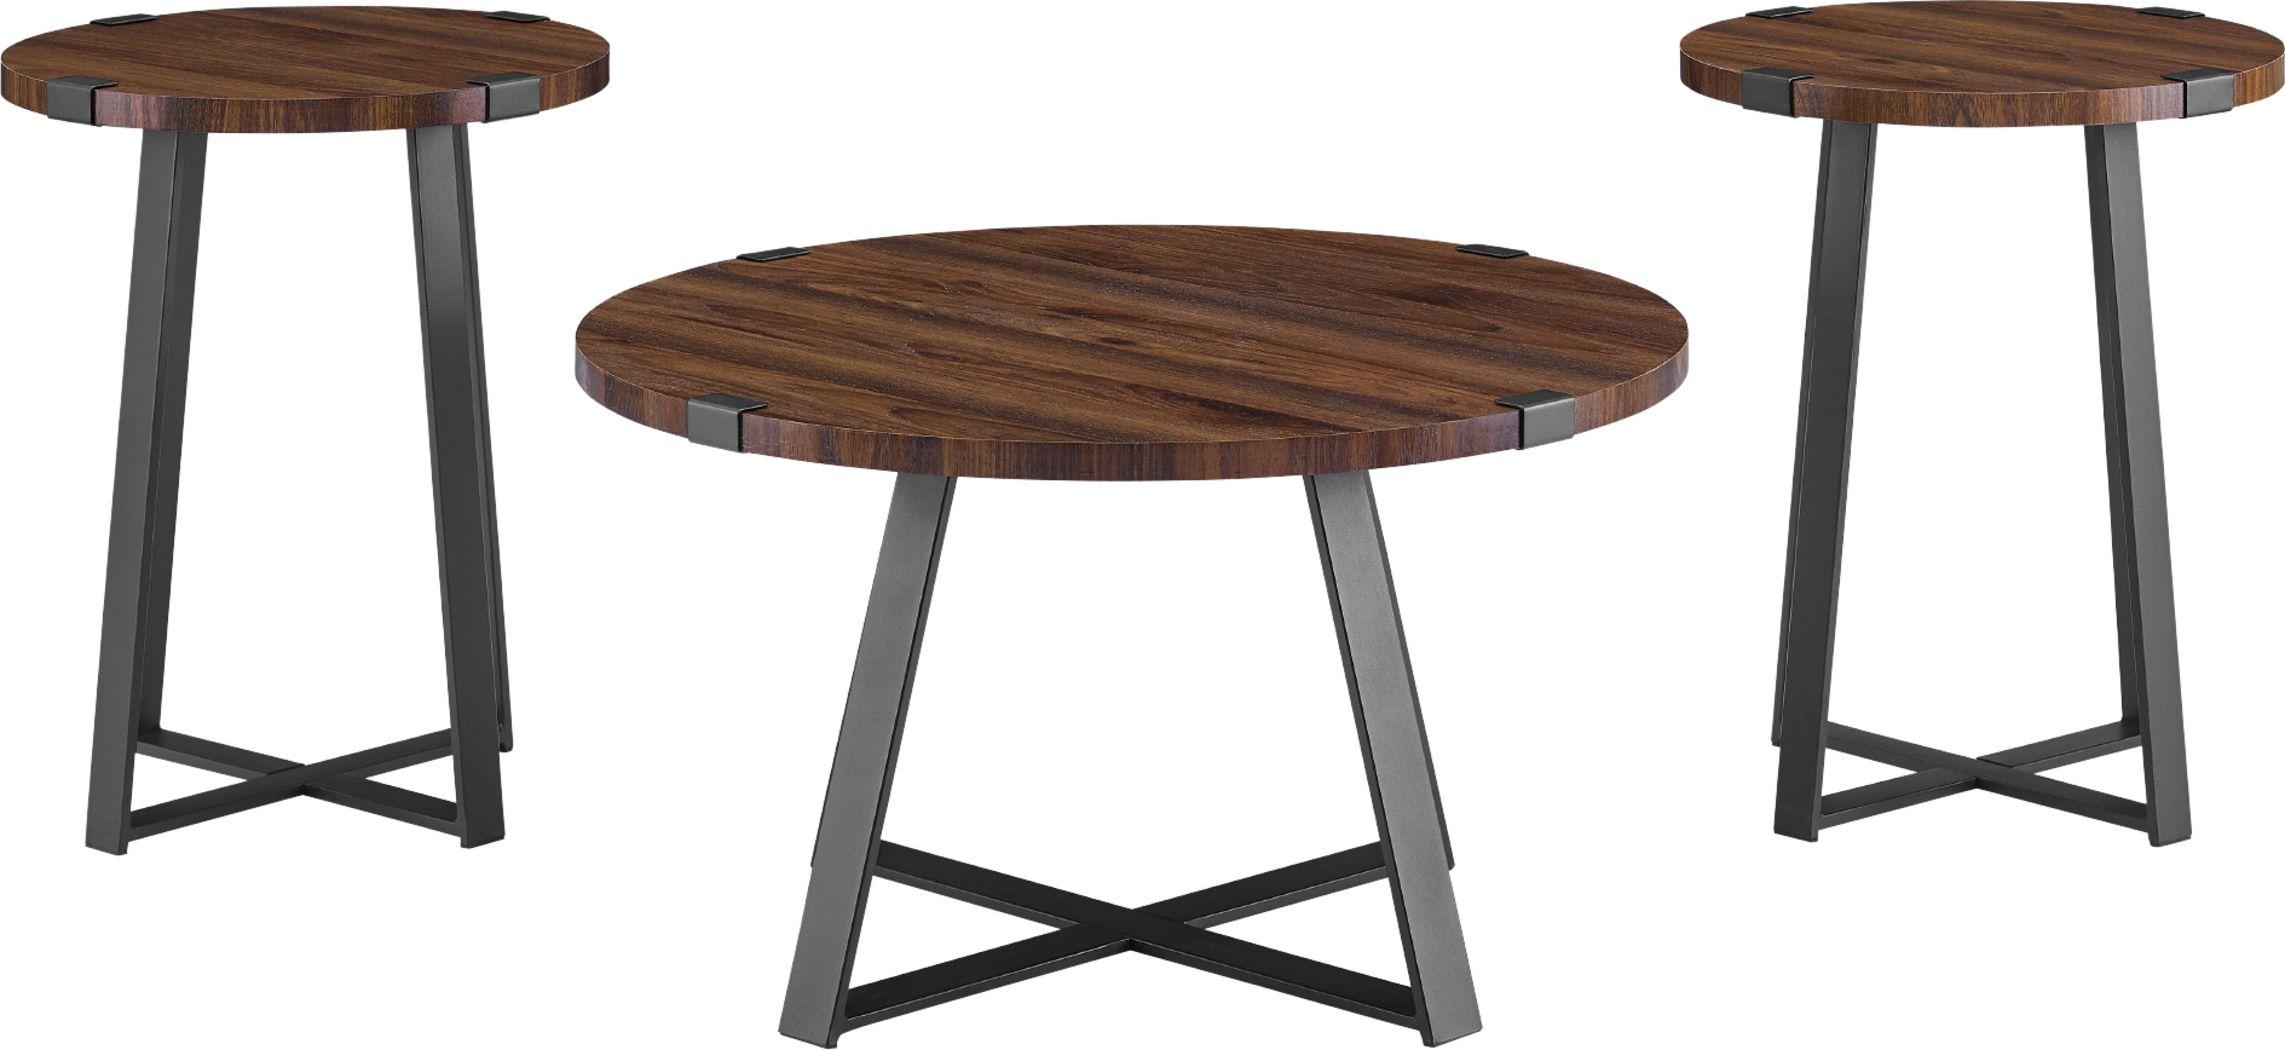 Castletroy Walnut Cocktail Table Set